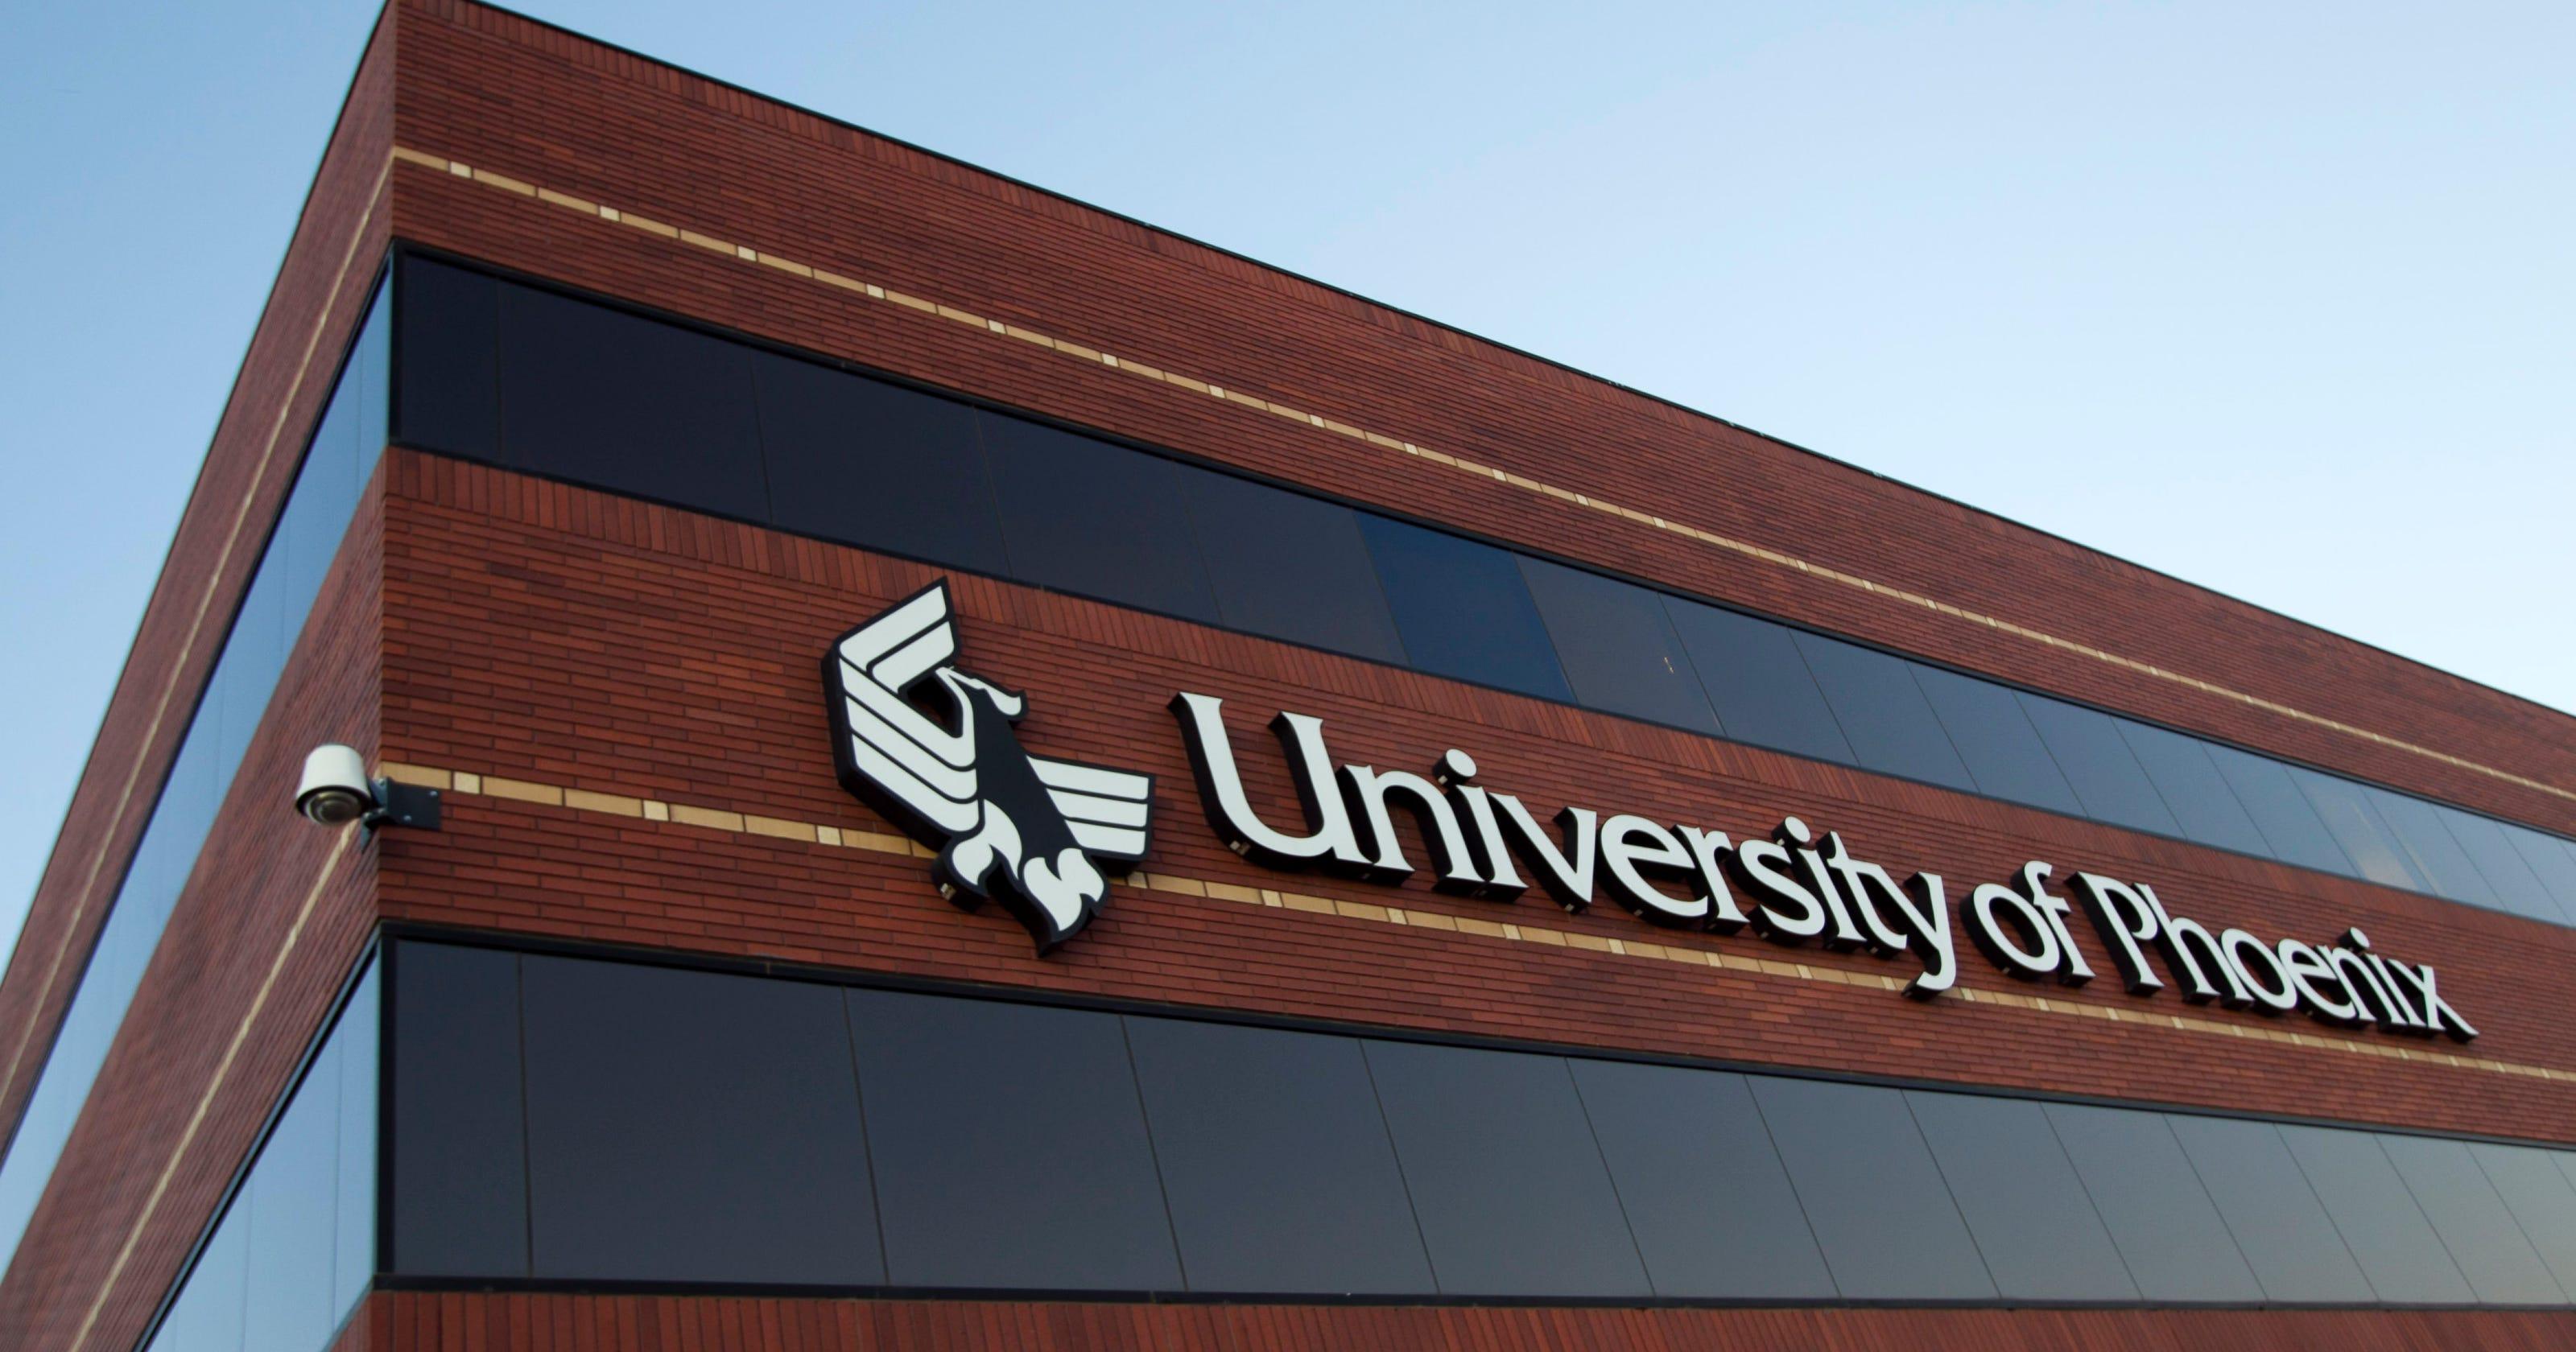 VA reverses course, won't suspend new GI Bill enrollments at University of Phoenix